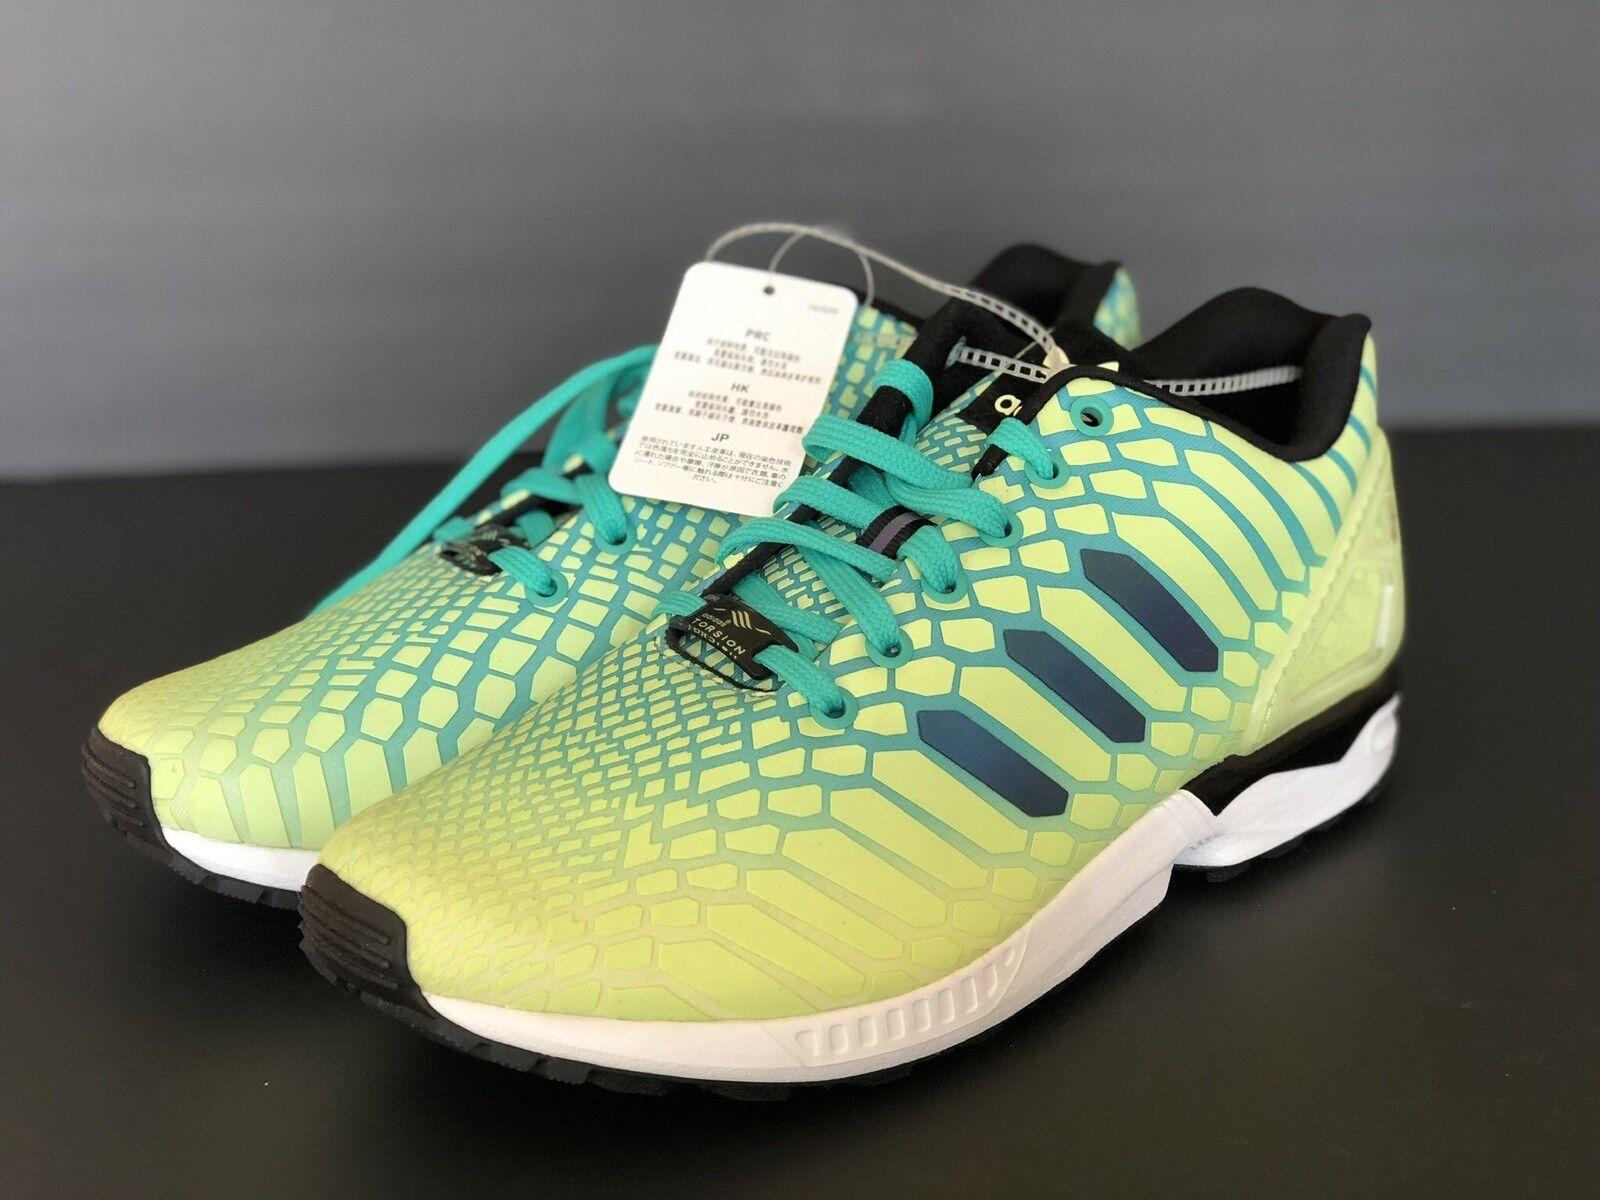 New Adidas ZX Flux Xeno Mens Size 10 Frozen Yellow   Glow In The Dark AQ8212